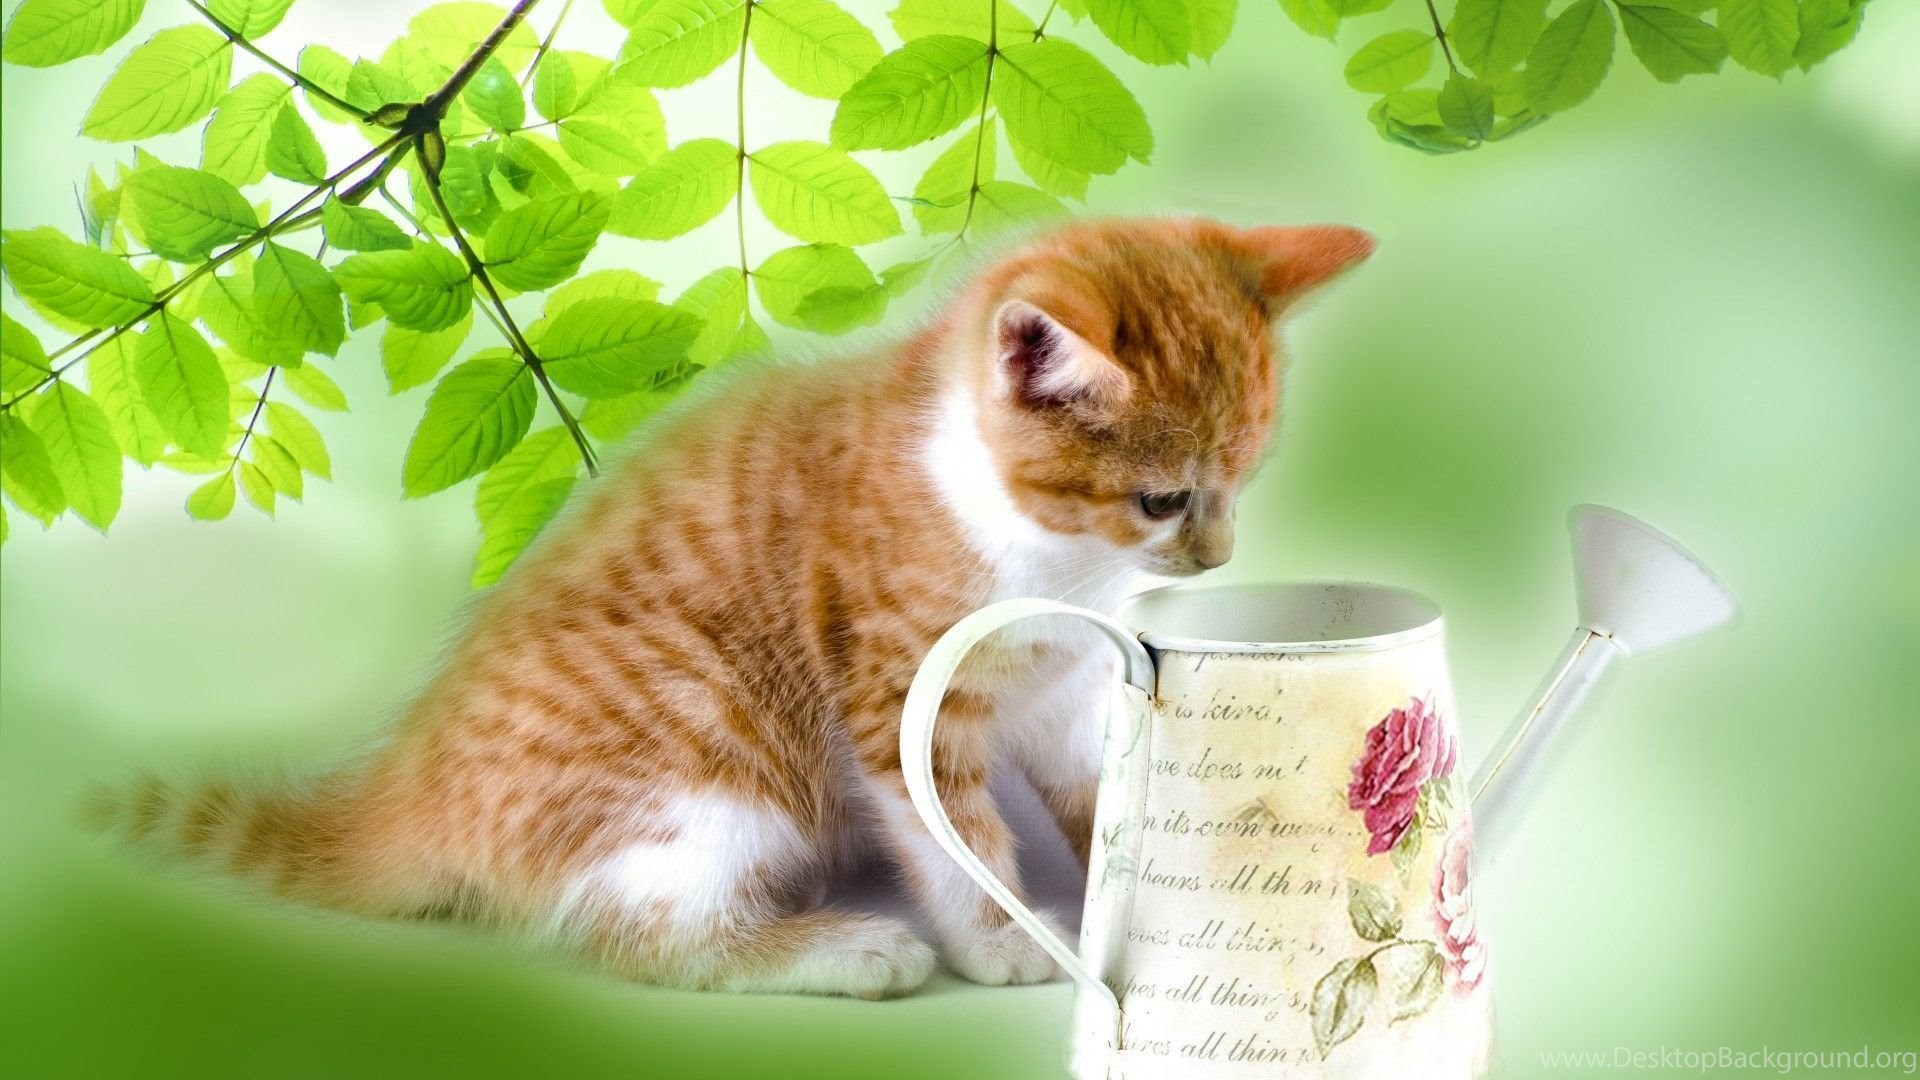 Cats kitten watering animals cute cats cans kittens wallpapers popular altavistaventures Images